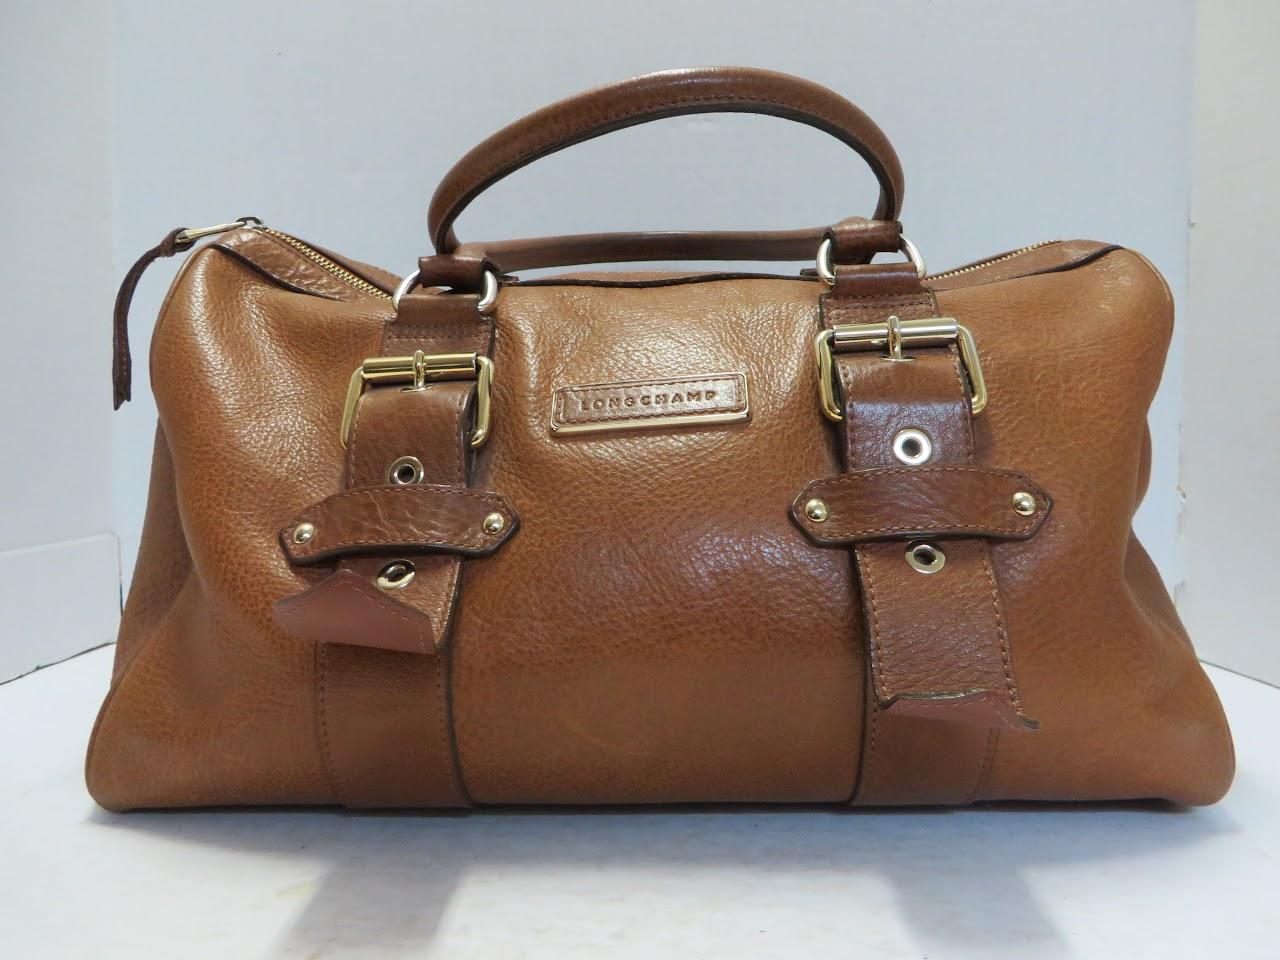 Kate Moss x Longchamp Shoulder Bag